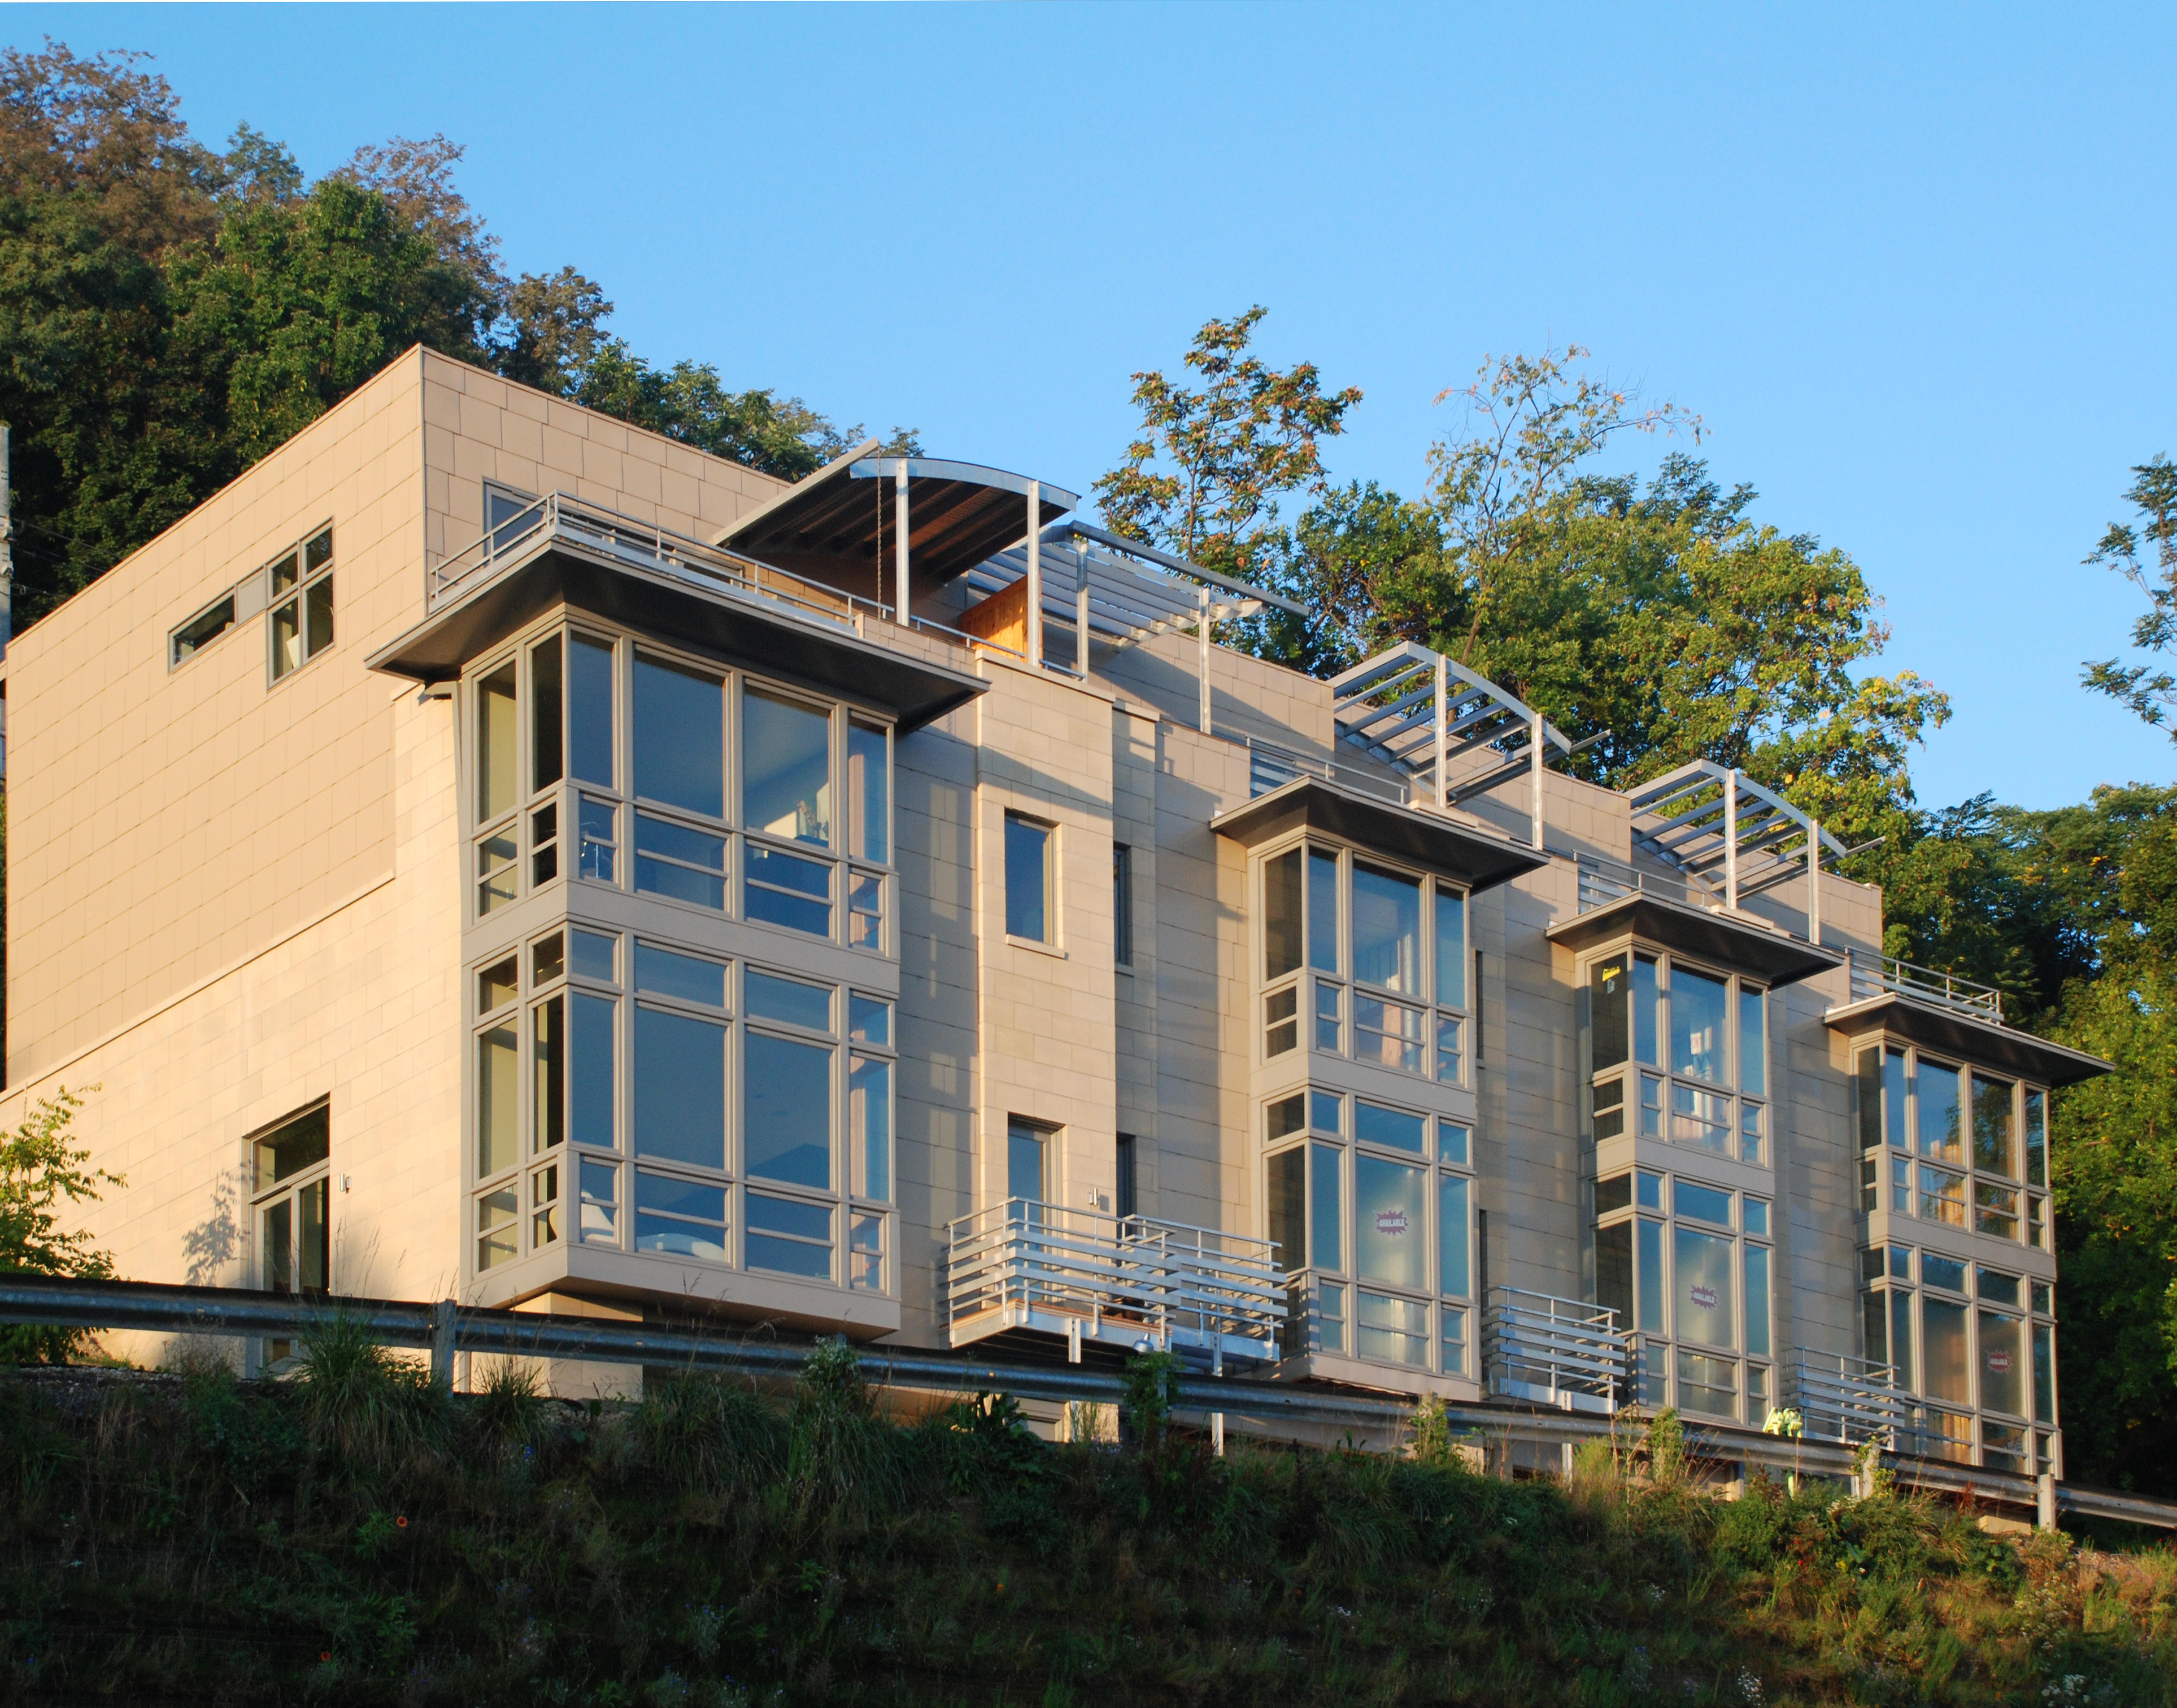 Concrete Building - Windom